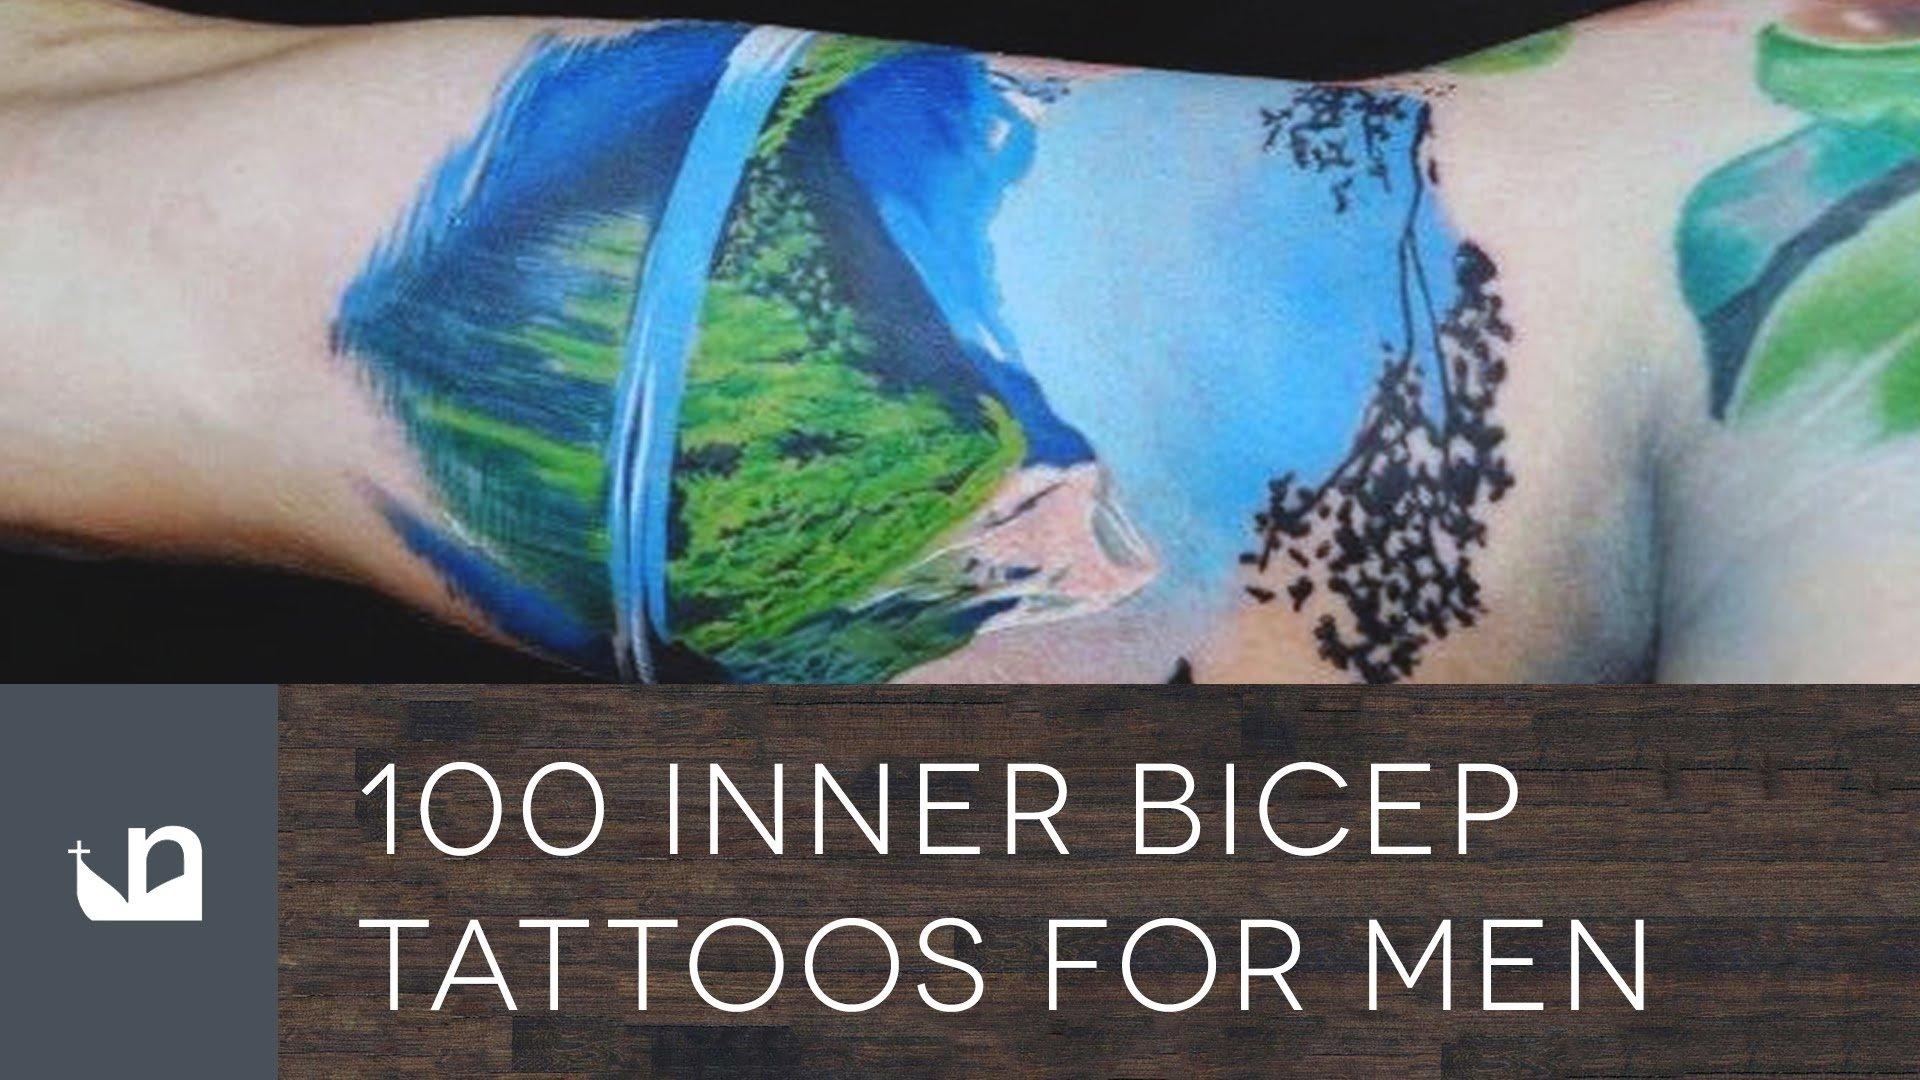 10 Spectacular Inner Bicep Tattoo Ideas For Men 100 inner bicep tattoos for men youtube 2020